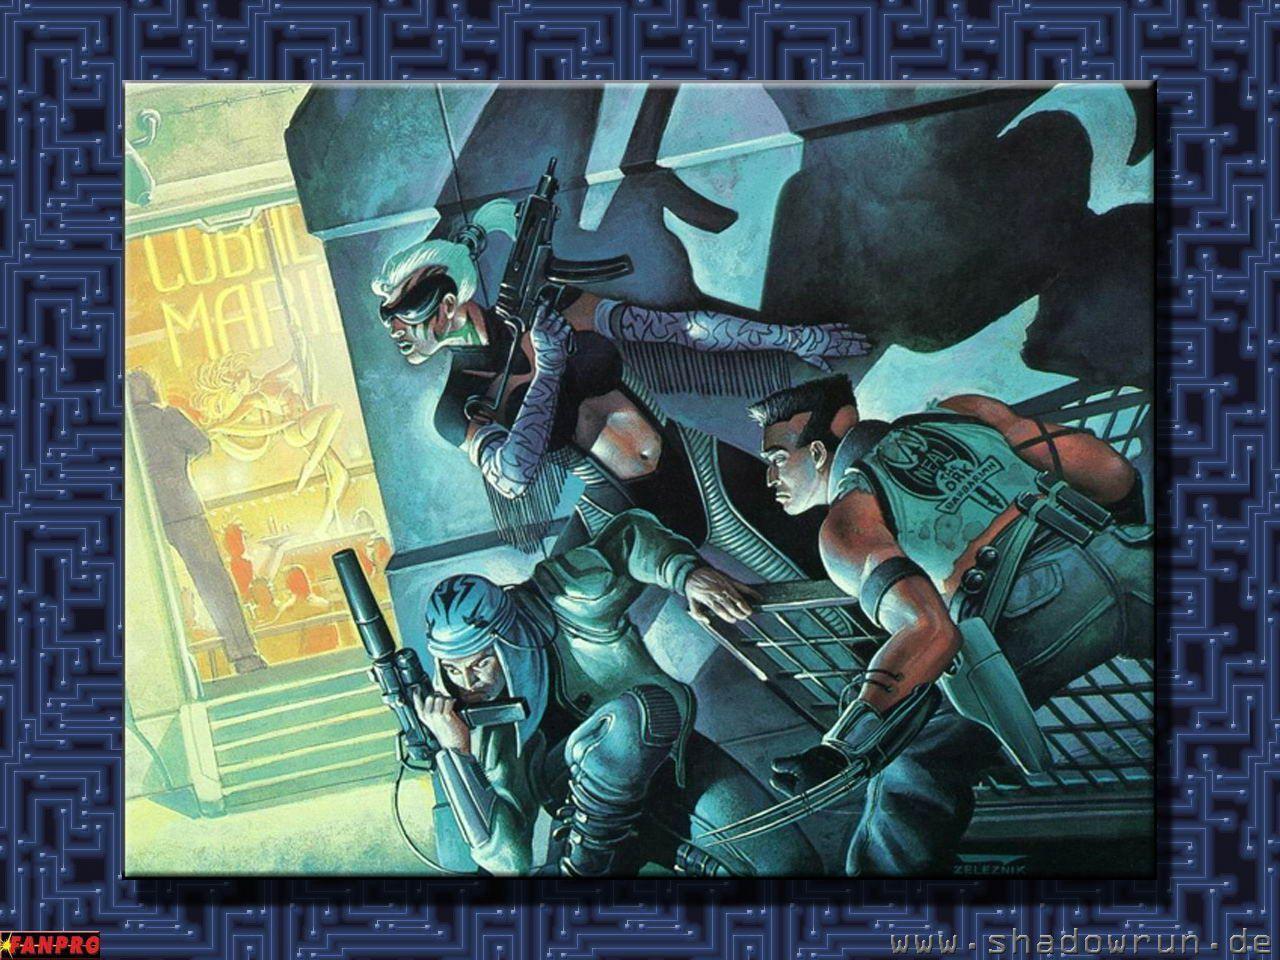 Shadowrun Wallpaper Gallery Shadowrun Scifi Fantasy Art Shadowrun Rpg